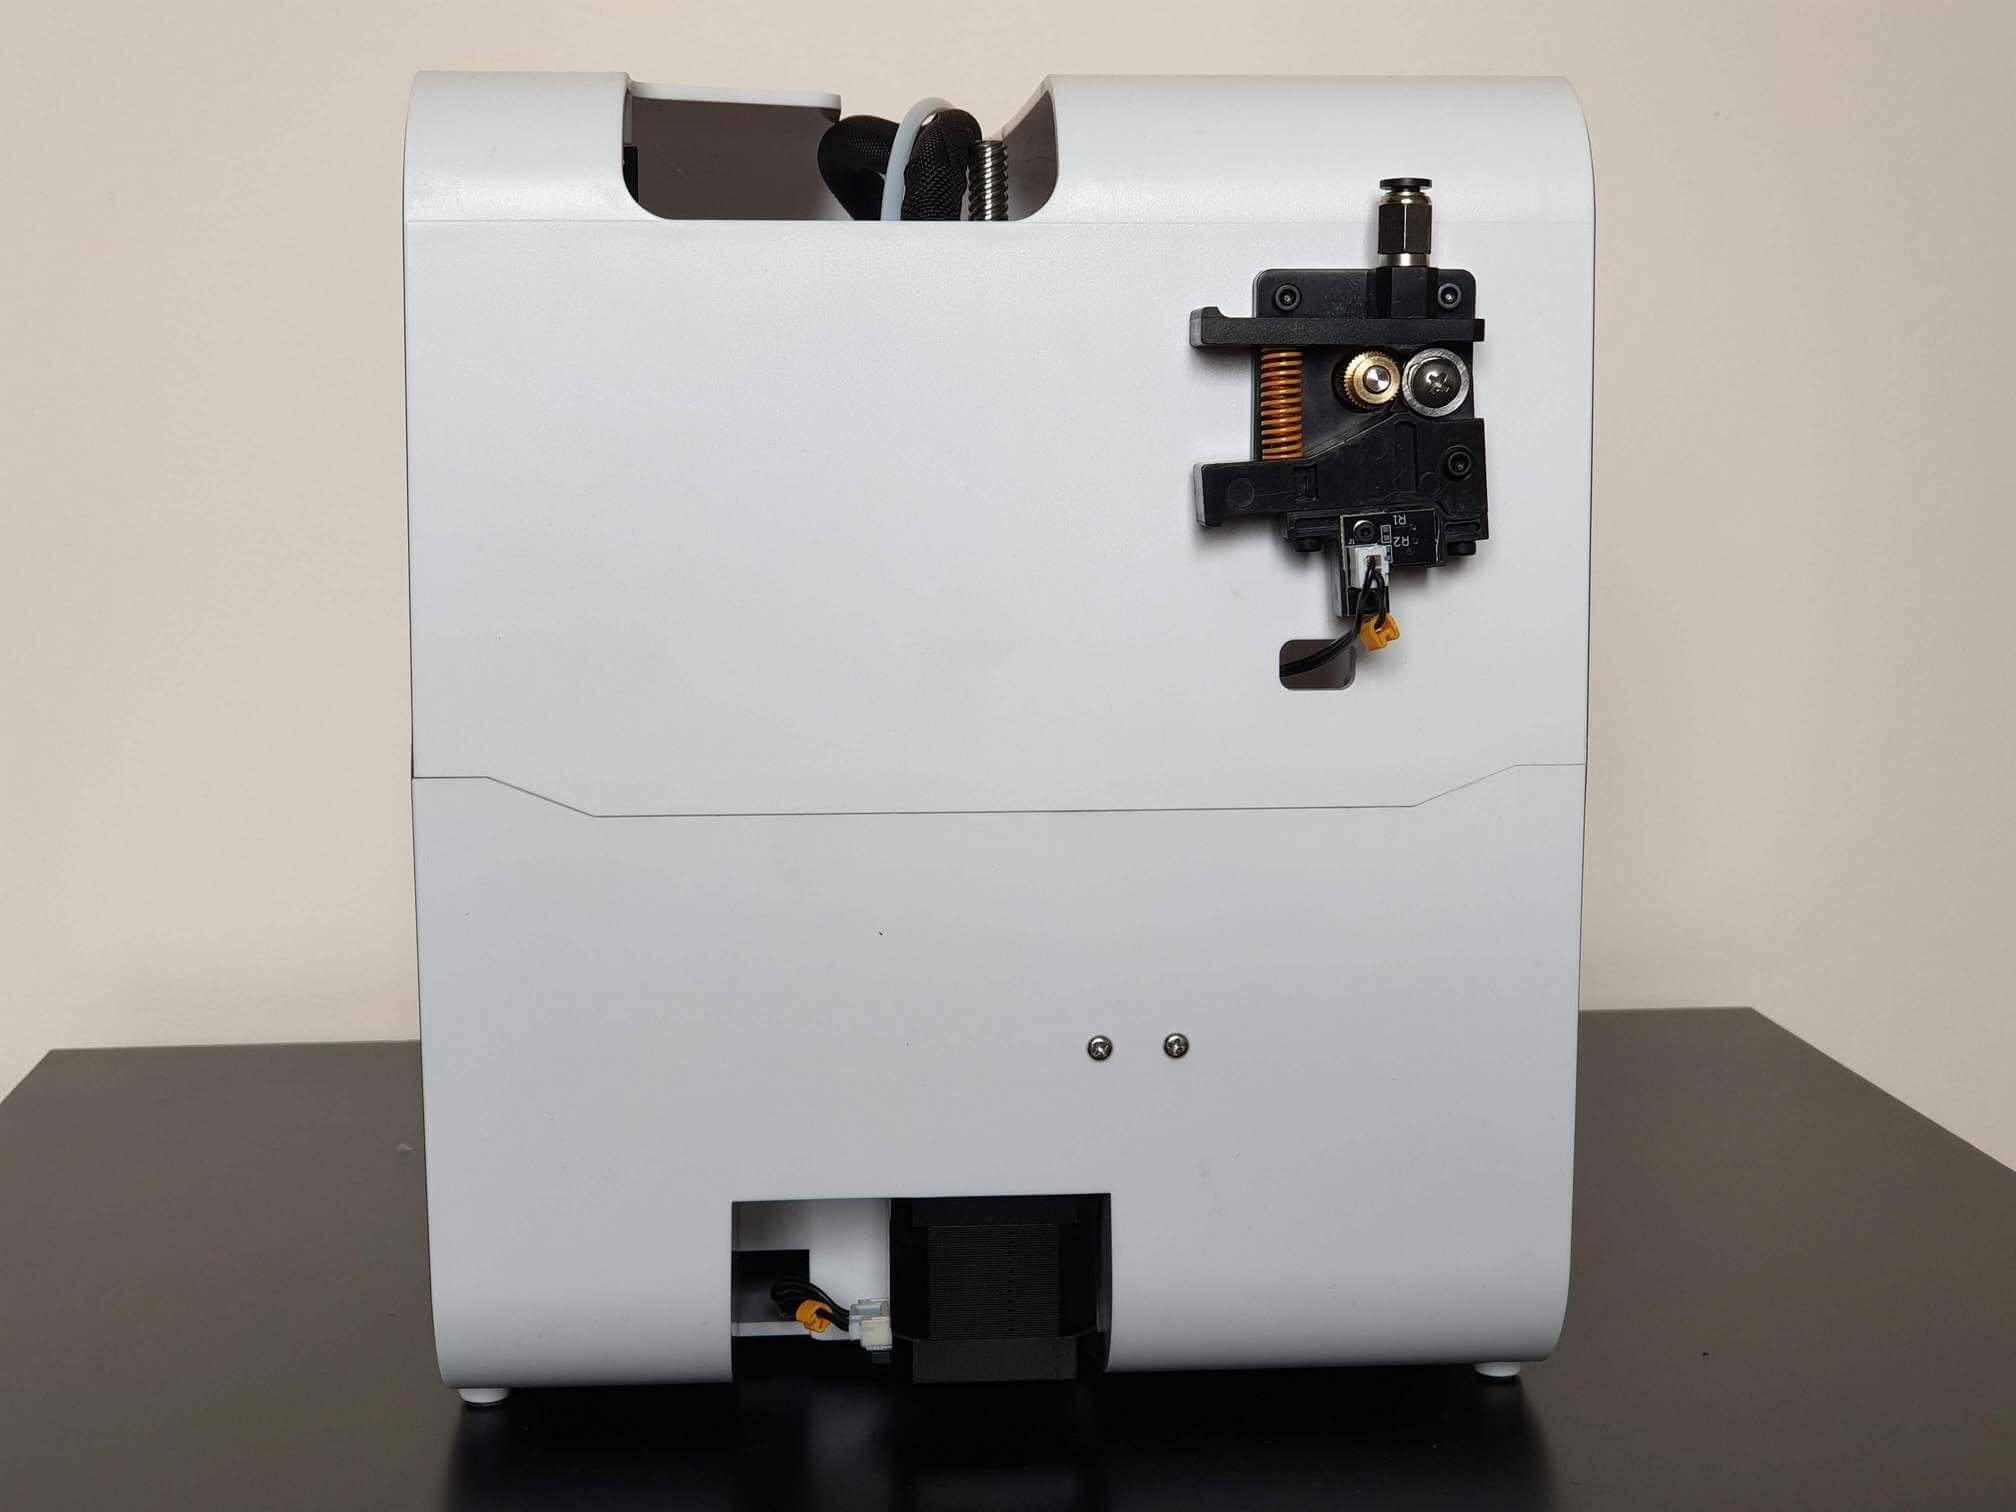 Longer 2 Mini Design 1 | Cube2 Mini Review - 3D Printer for Kids